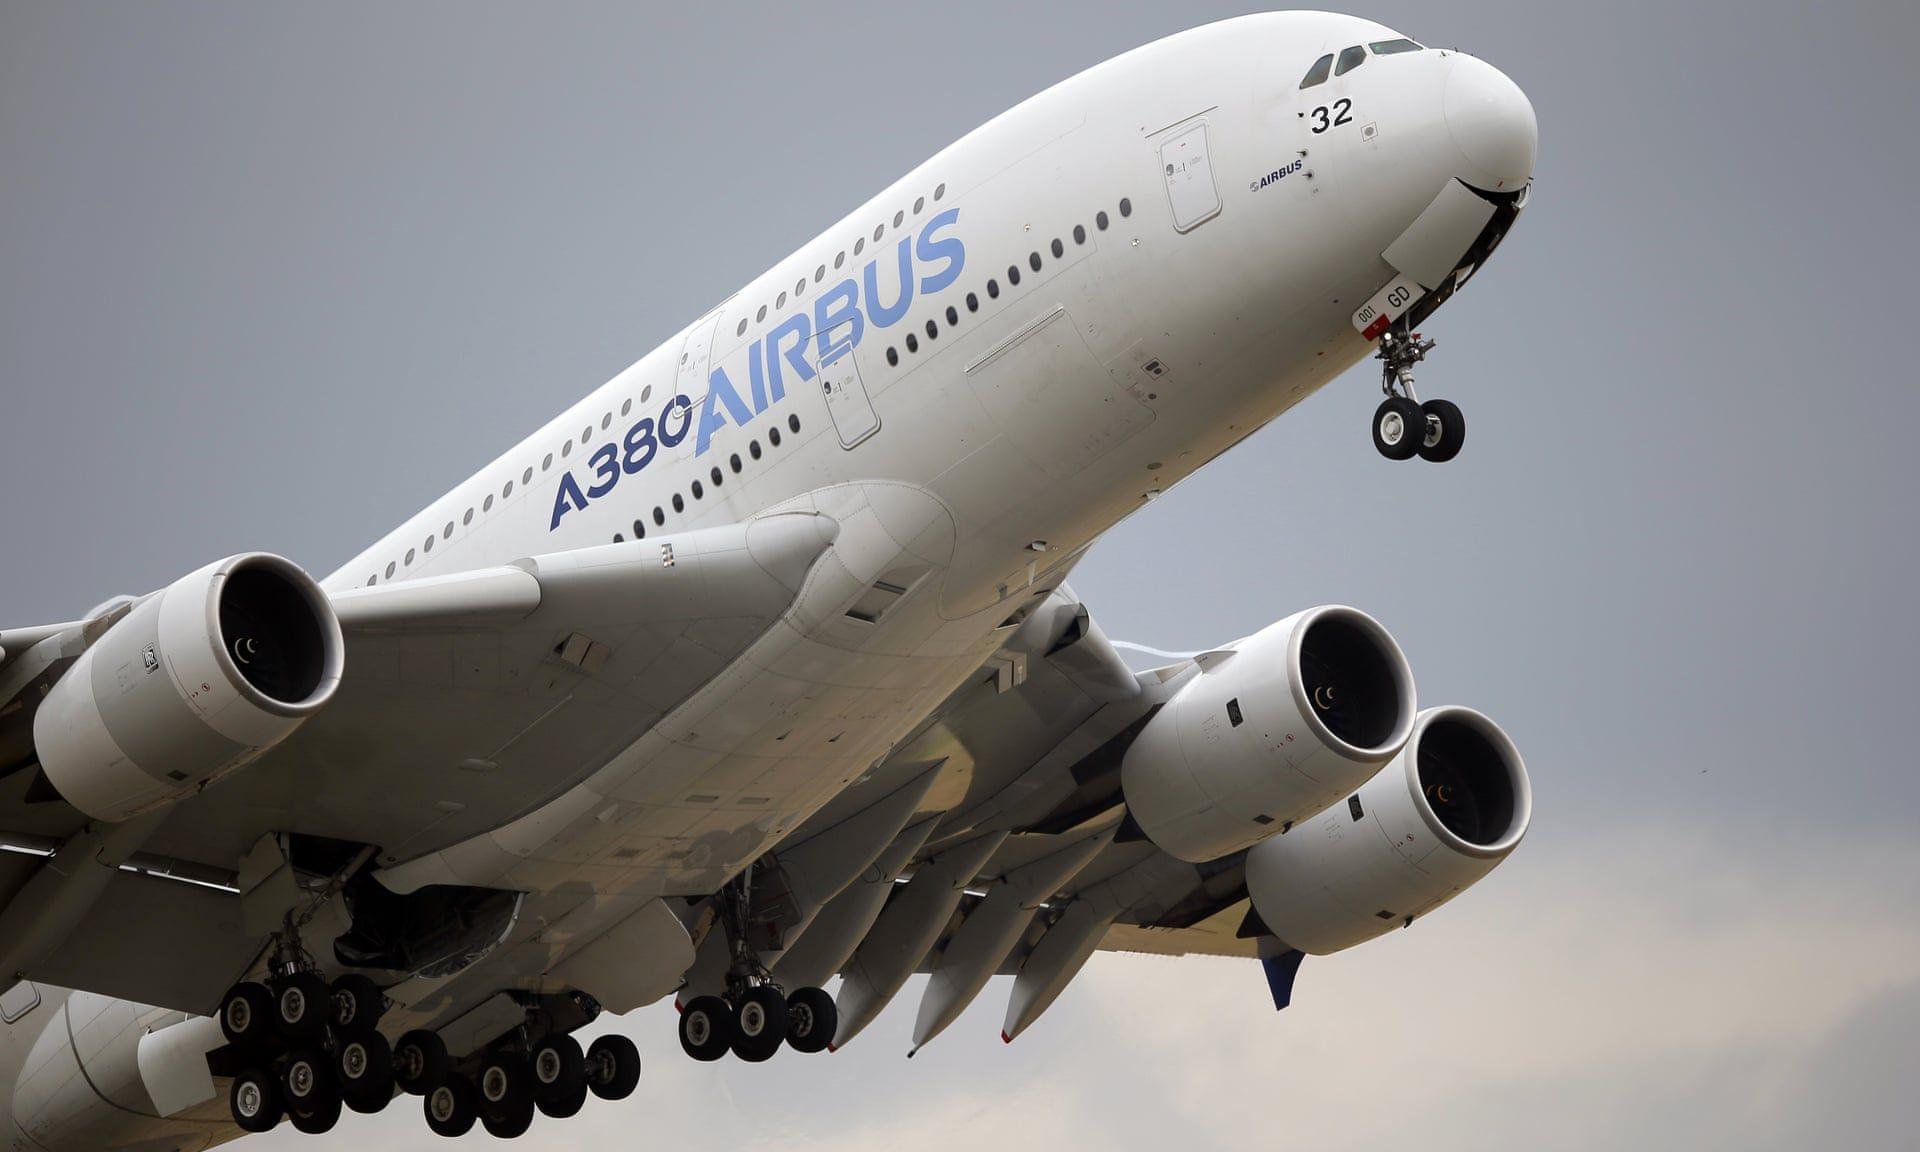 20210415-luong-may-bay-ban-giao-trong-nua-dau-nam-nay-cua-airbus-tang-52-1